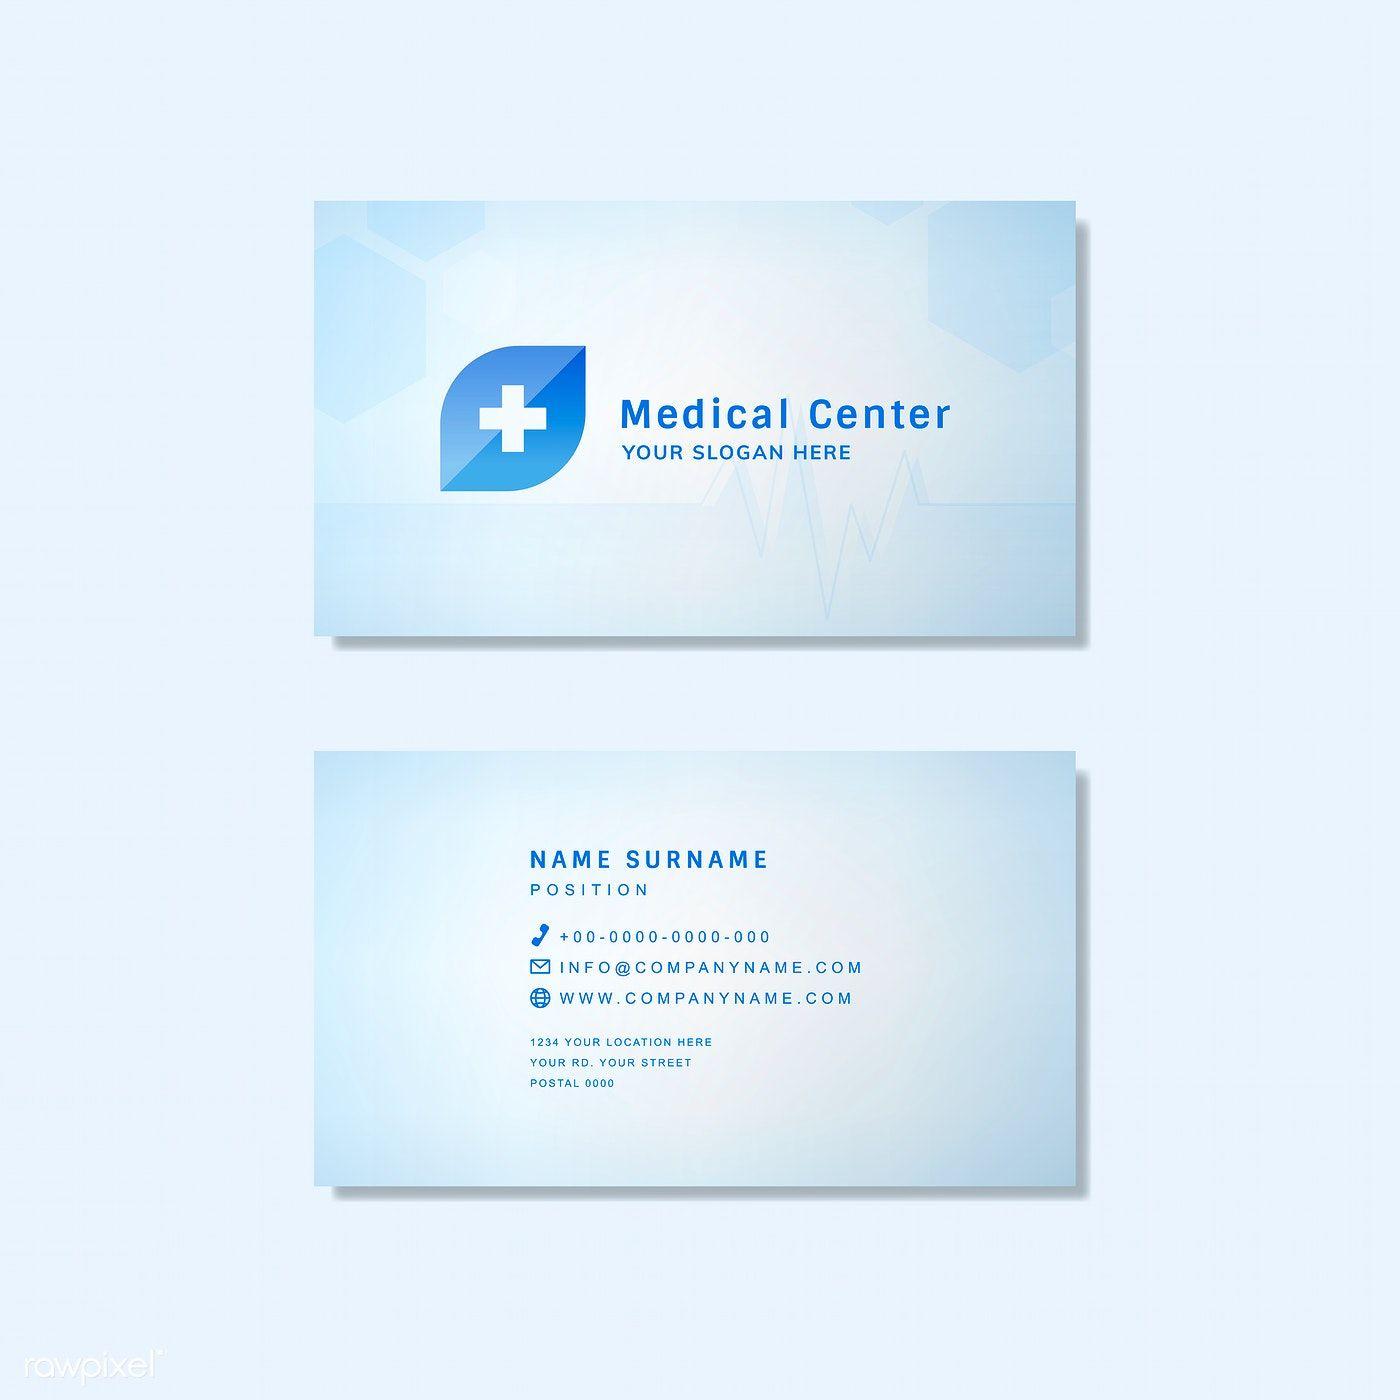 Medical Professional Business Card Design Mockup Free Image By Rawpixel Medical Business Card Medical Business Card Design Professional Business Card Design